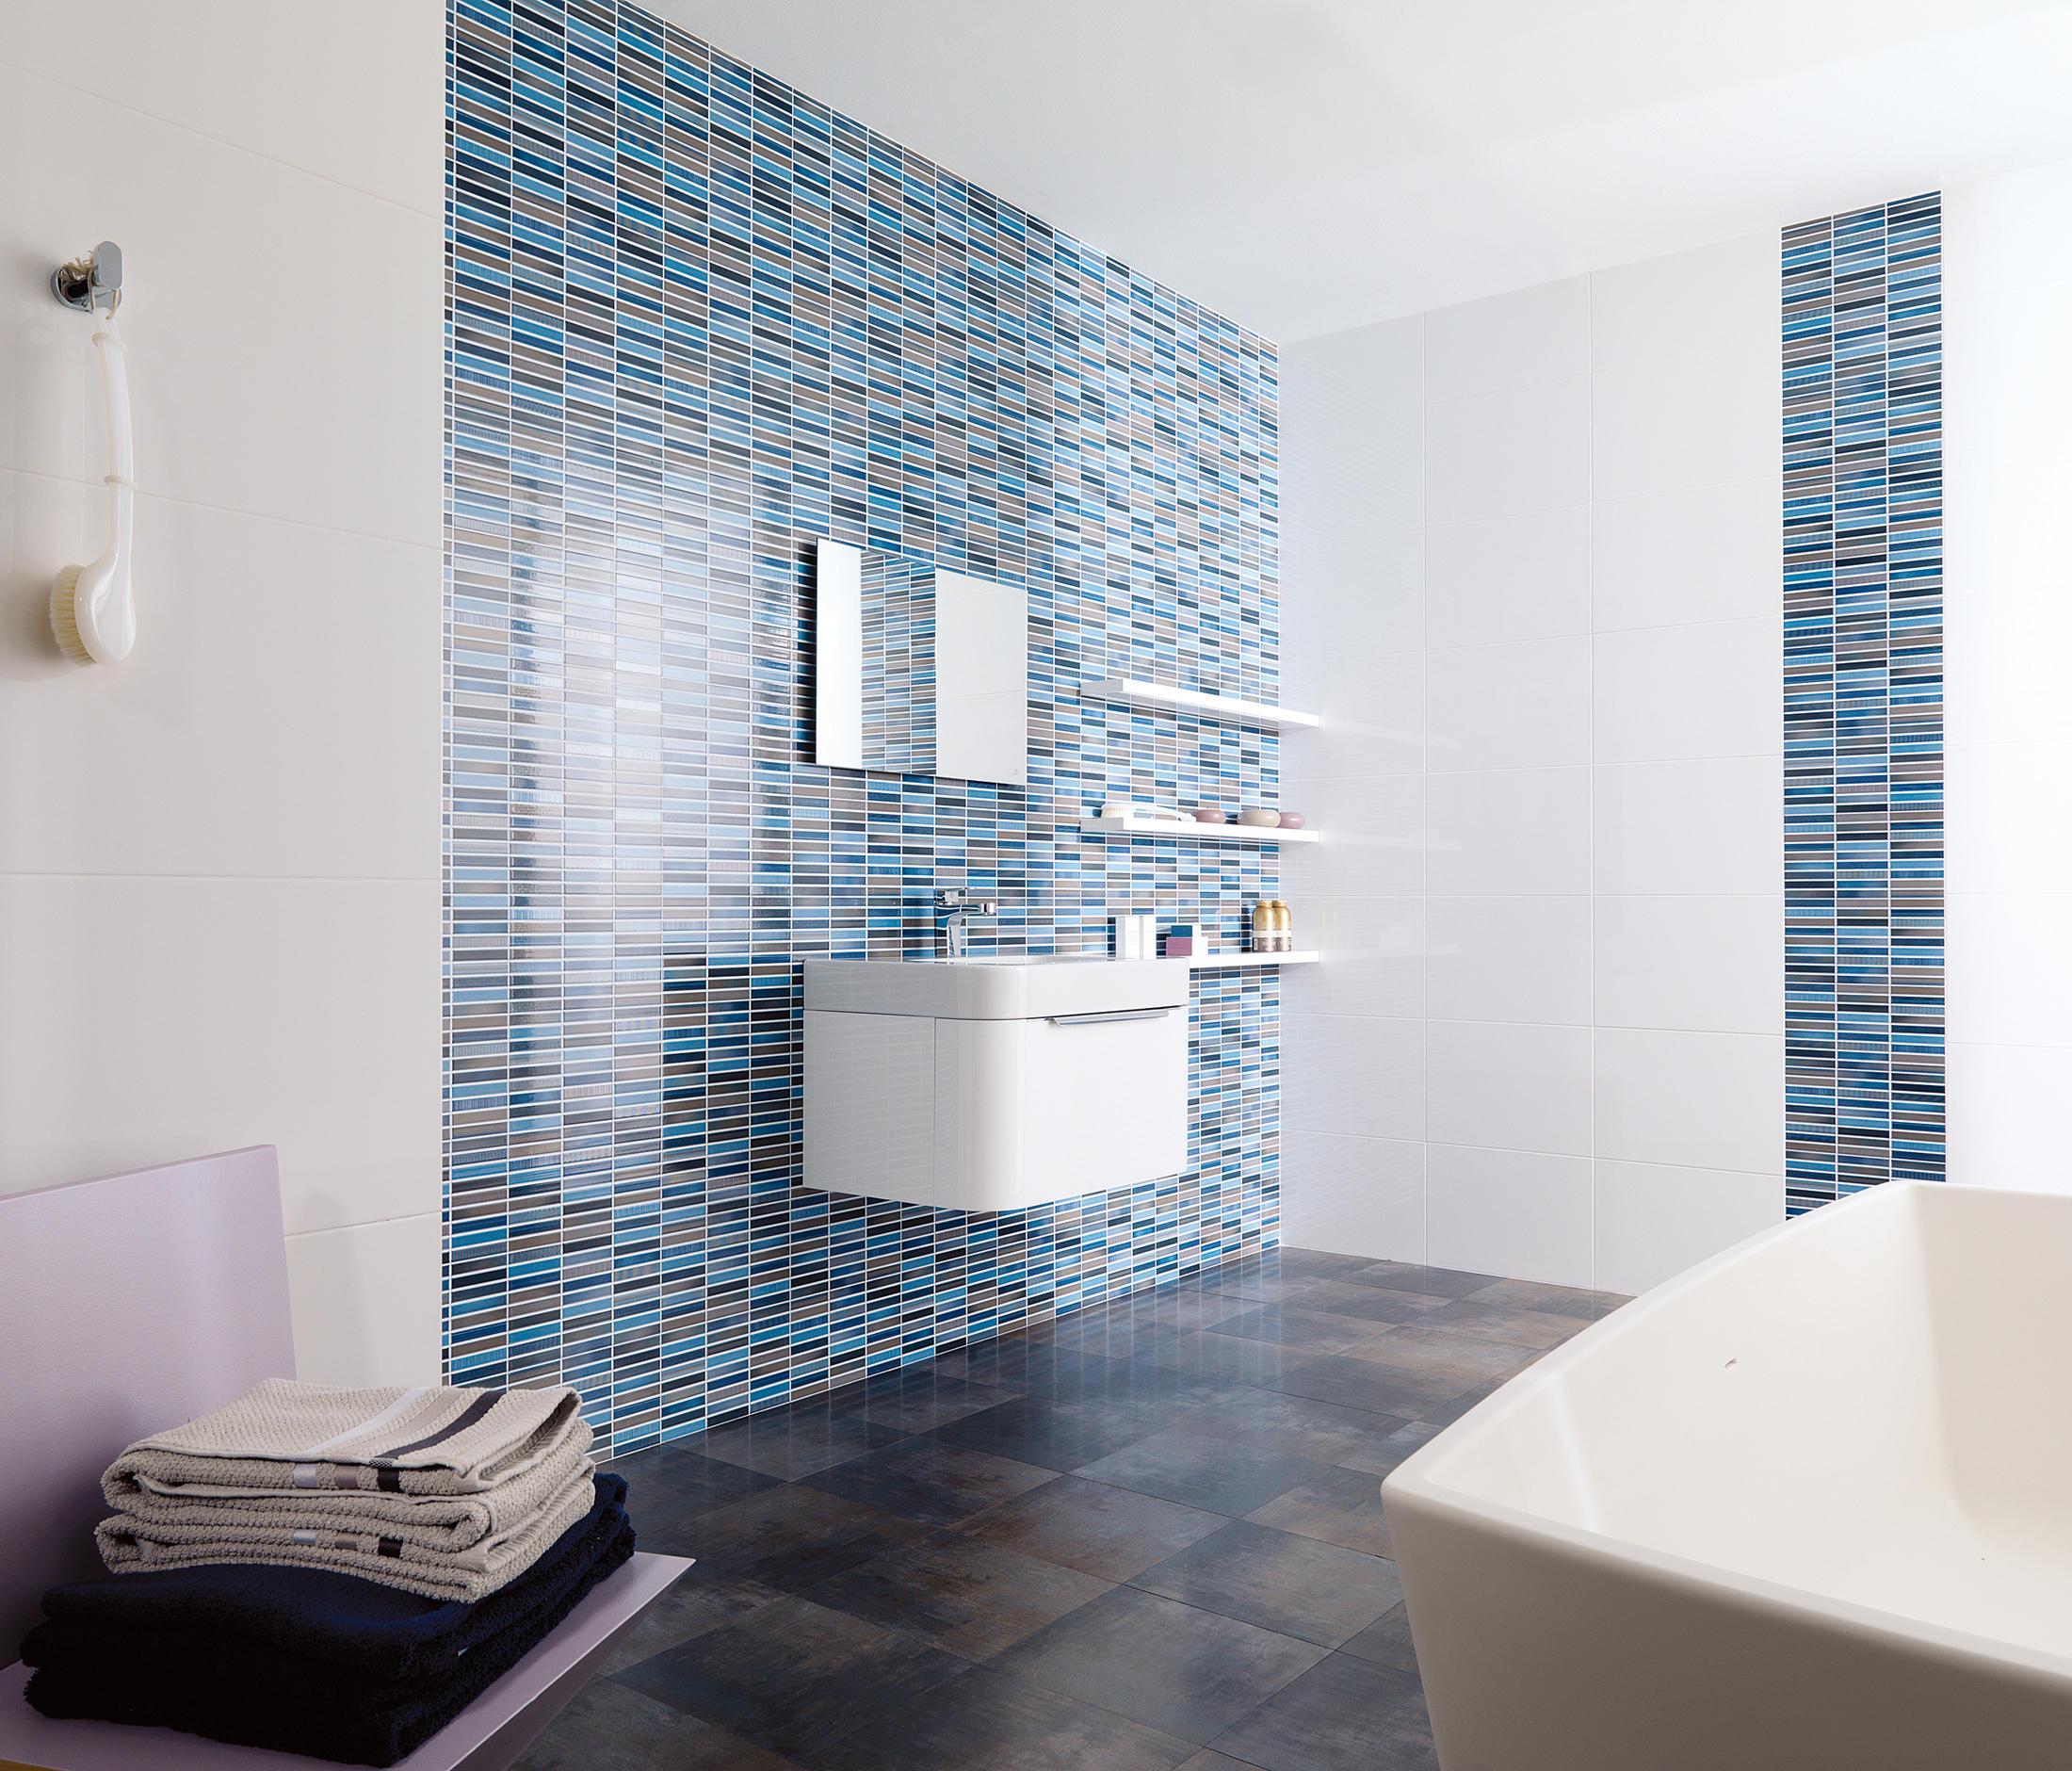 MIDI BLANCO - Ceramic tiles from Porcelanosa | Architonic